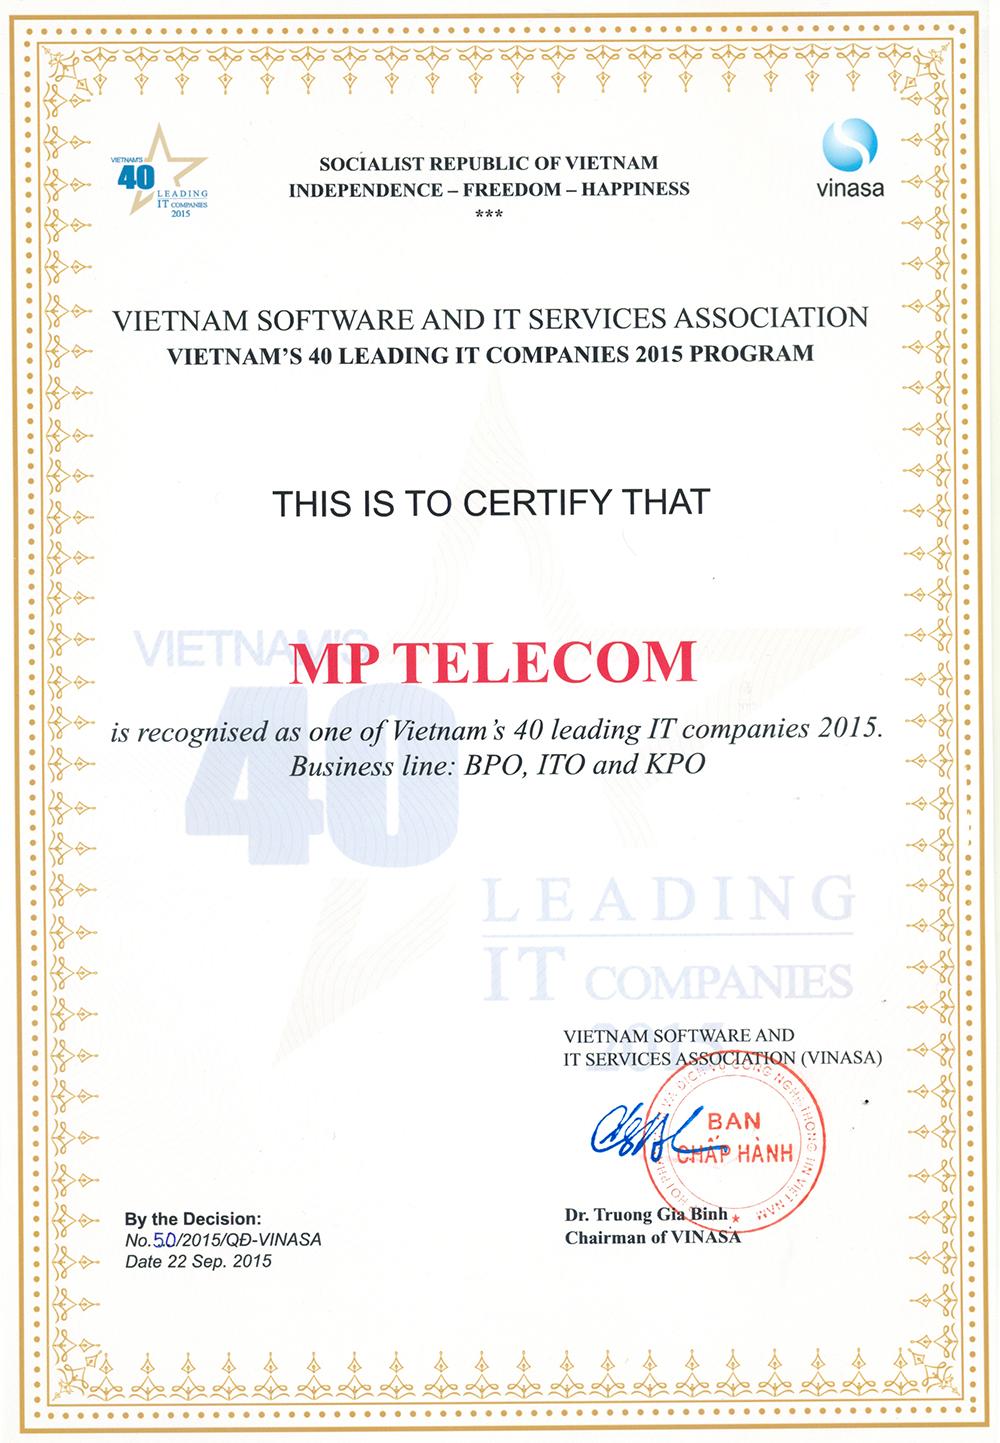 MPTelecomInVietnam'sLeadingITCompanies